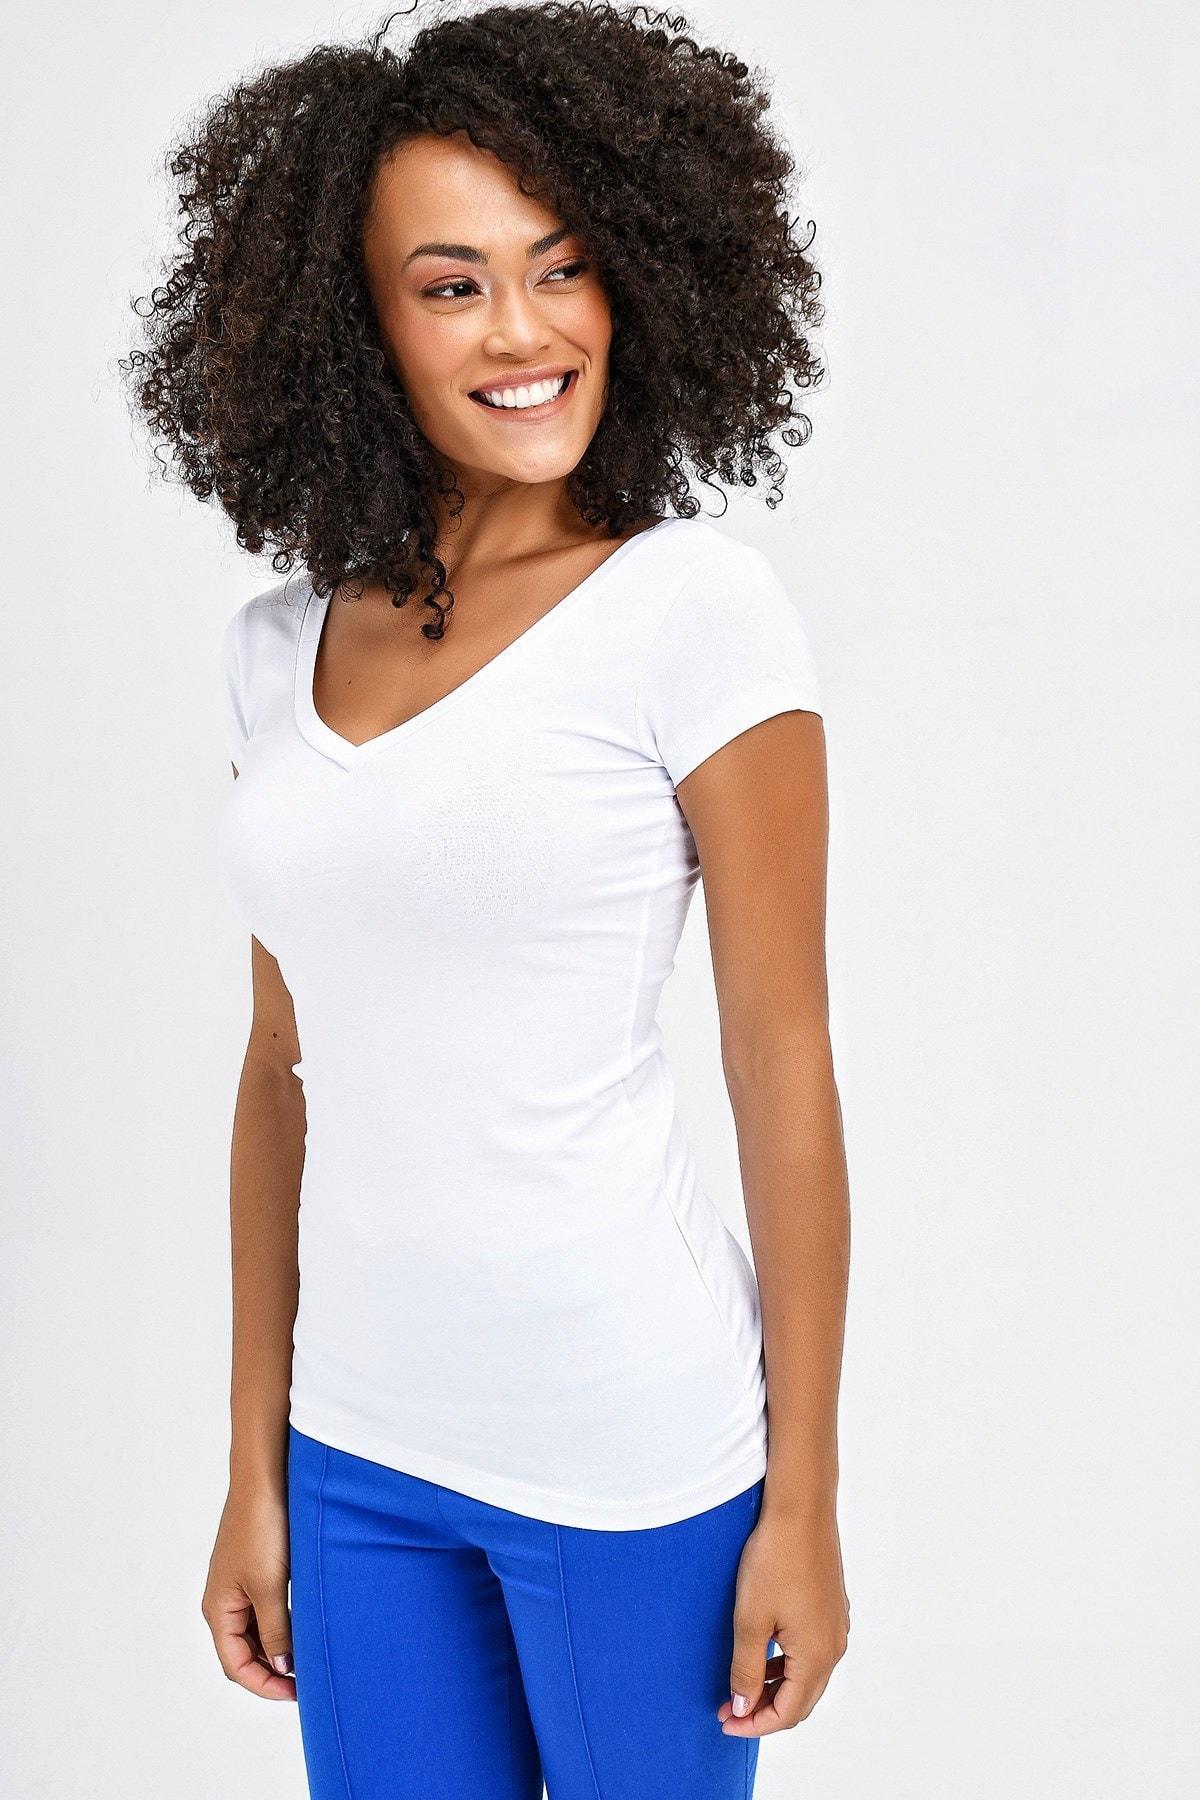 Jument Kadın Beyaz Ön-Arka V Yaka Kısa T-Shirt 5612 1